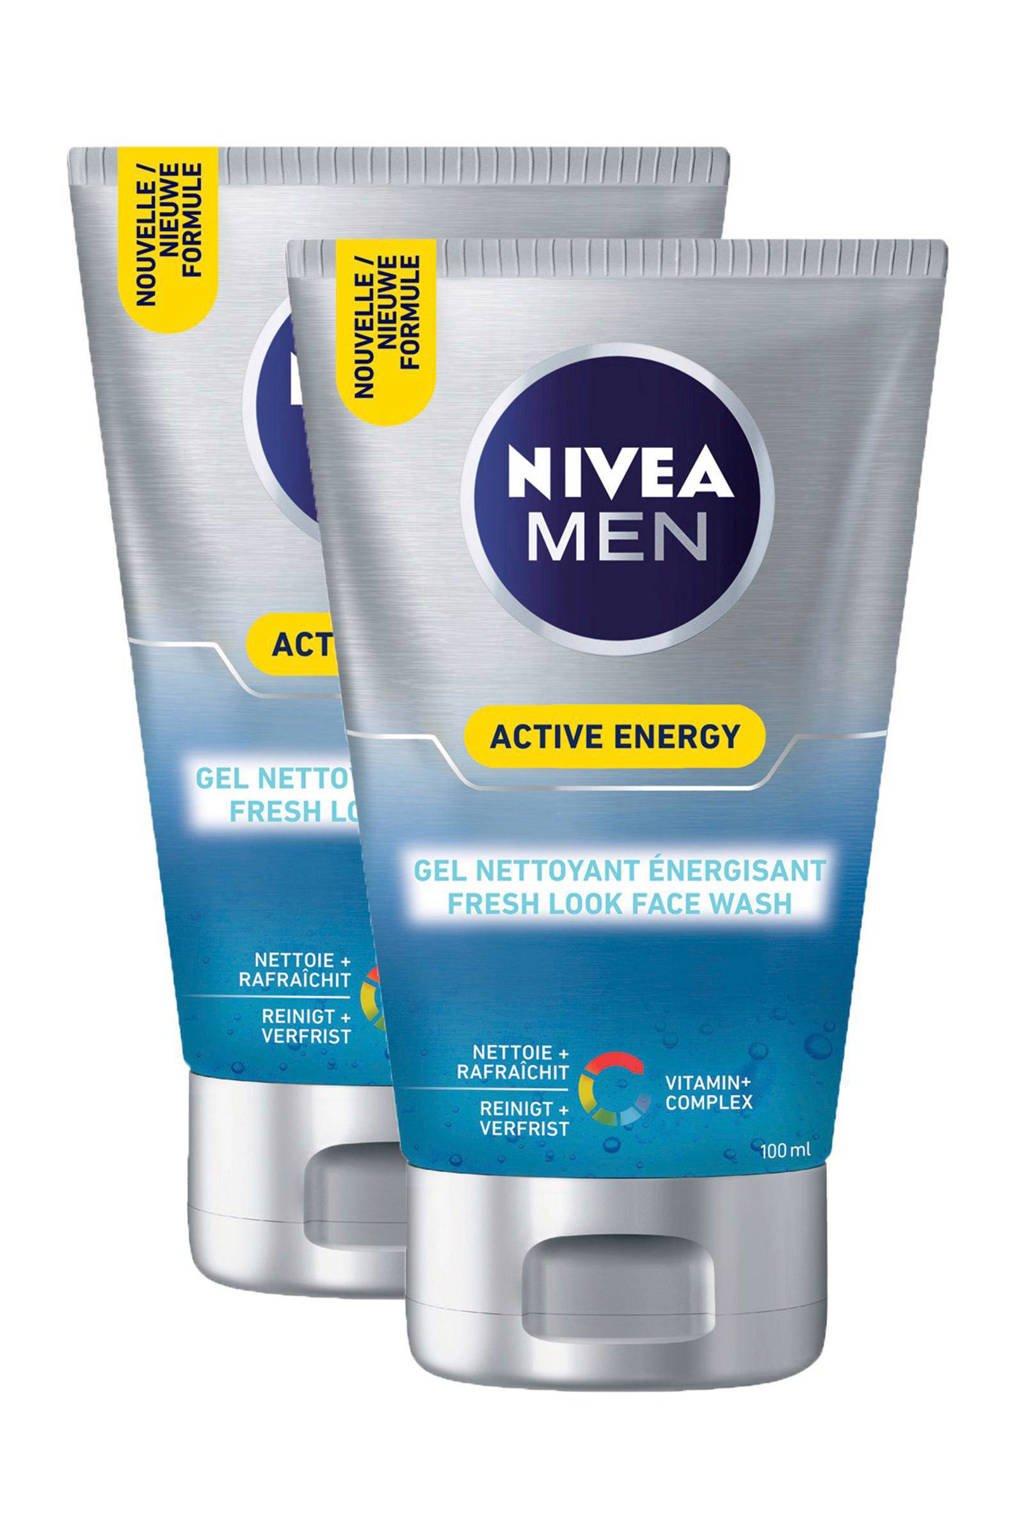 NIVEA FOR MEN Active Energy Face Wash